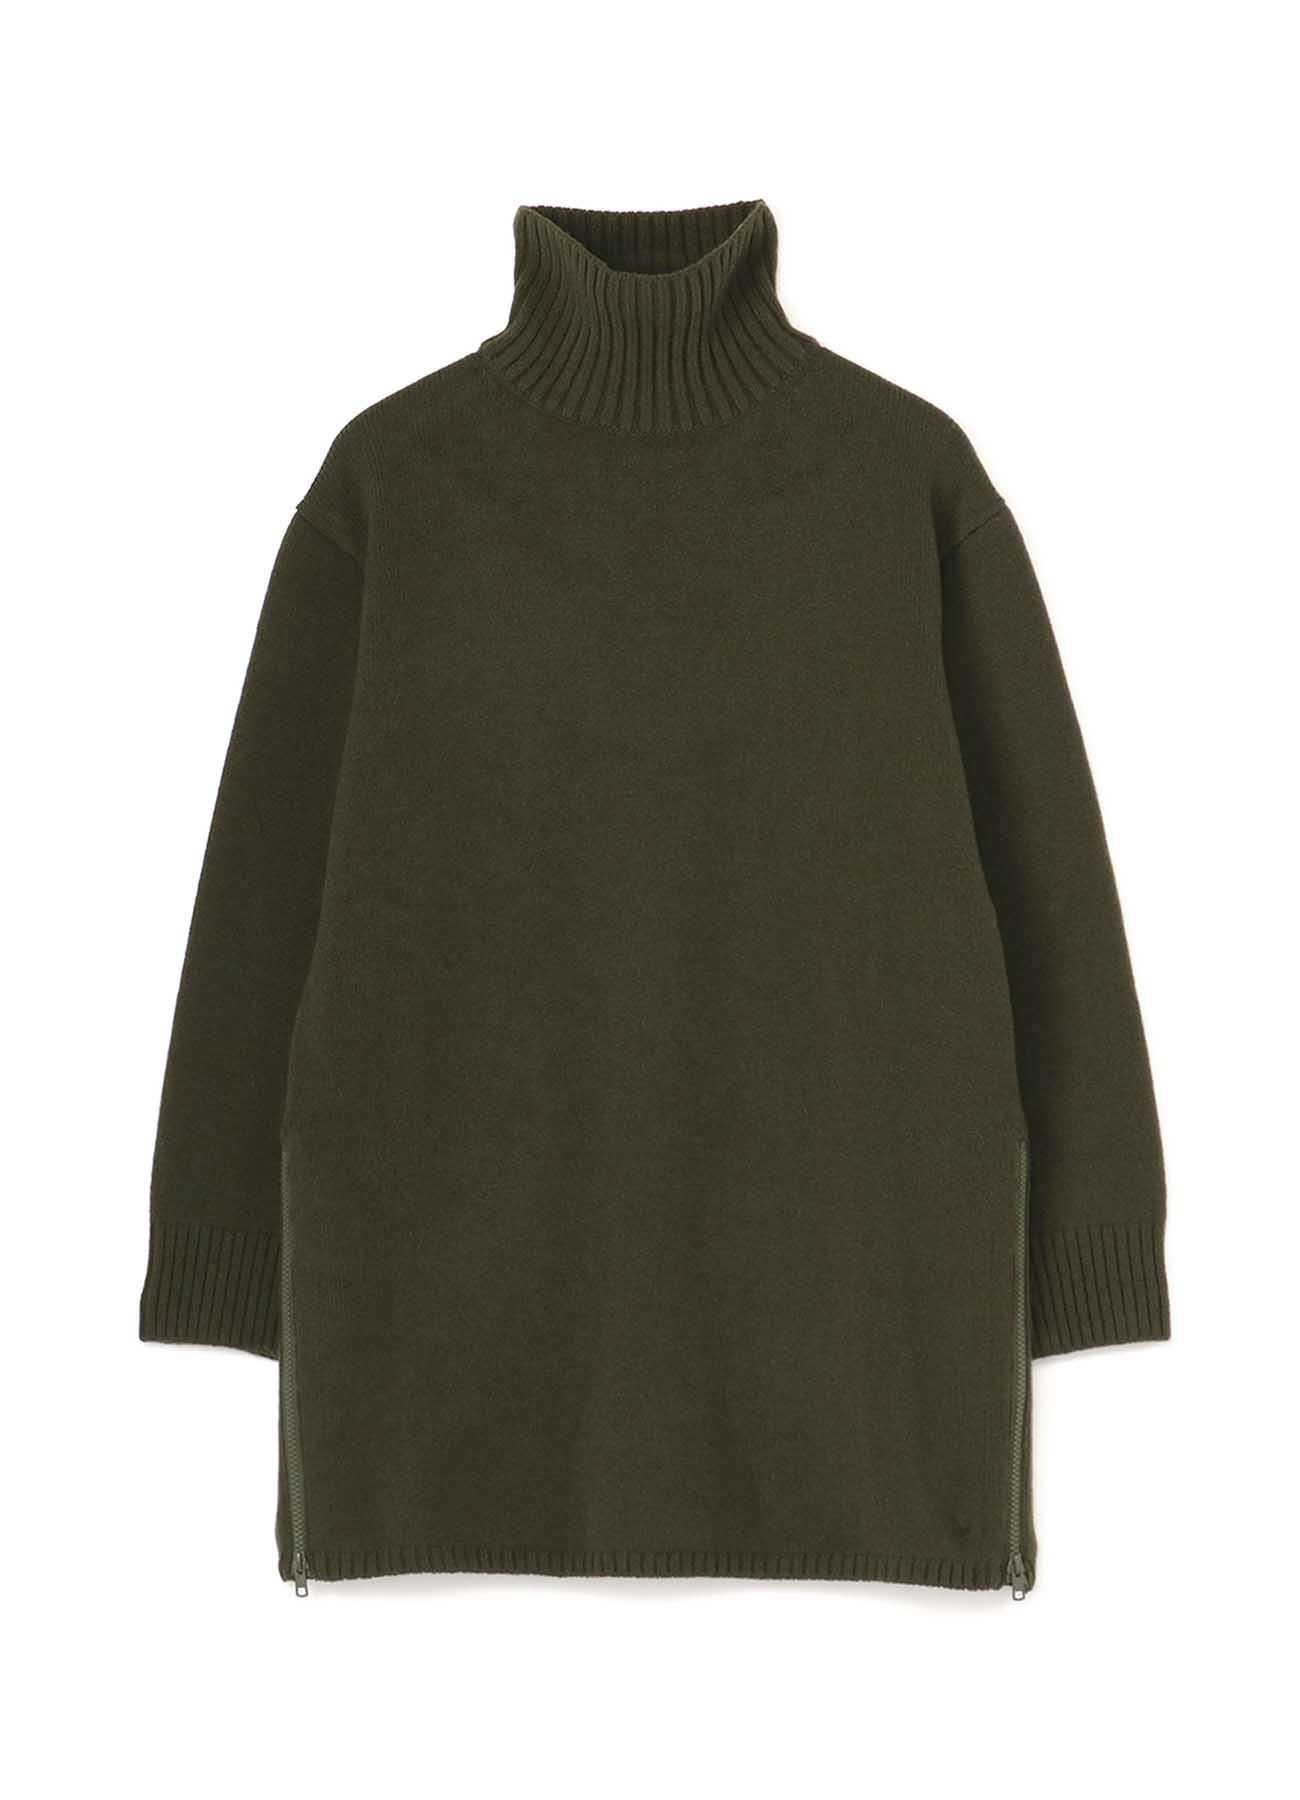 SLH Knit Turtleneck Zipper